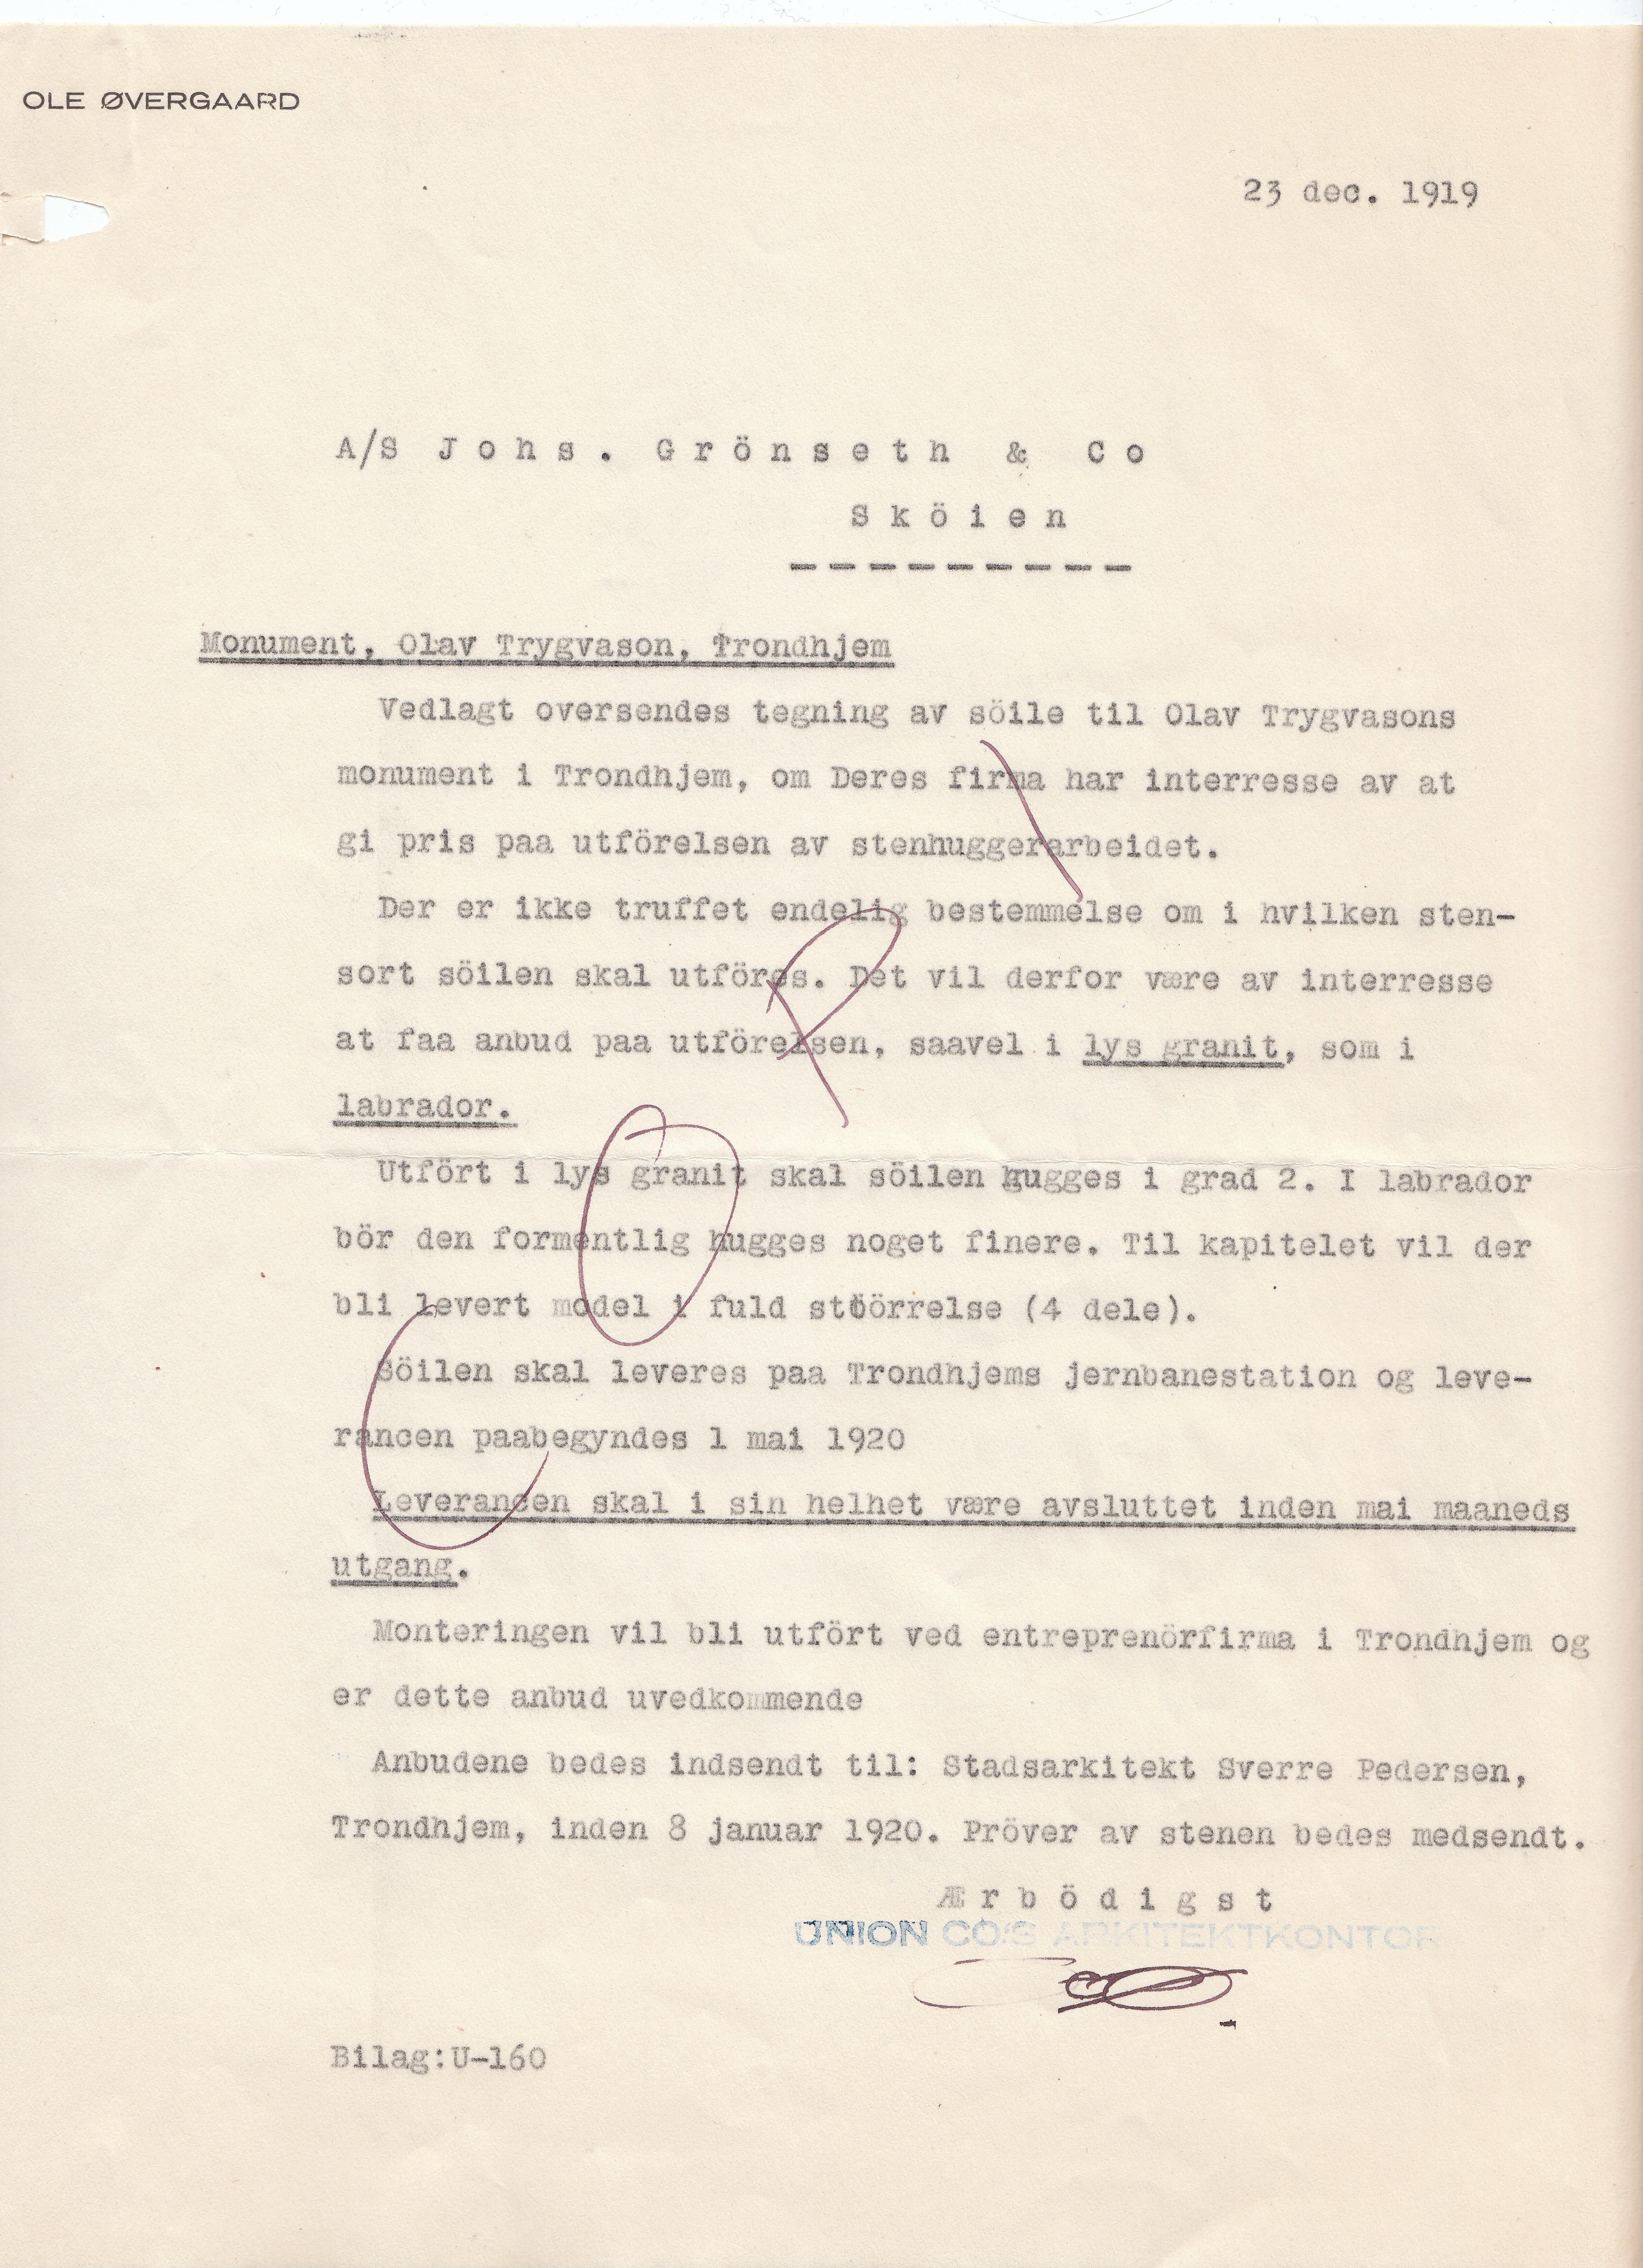 1919.12.23 - Forespørsel til firma A/S Johs. Grønseth & Co